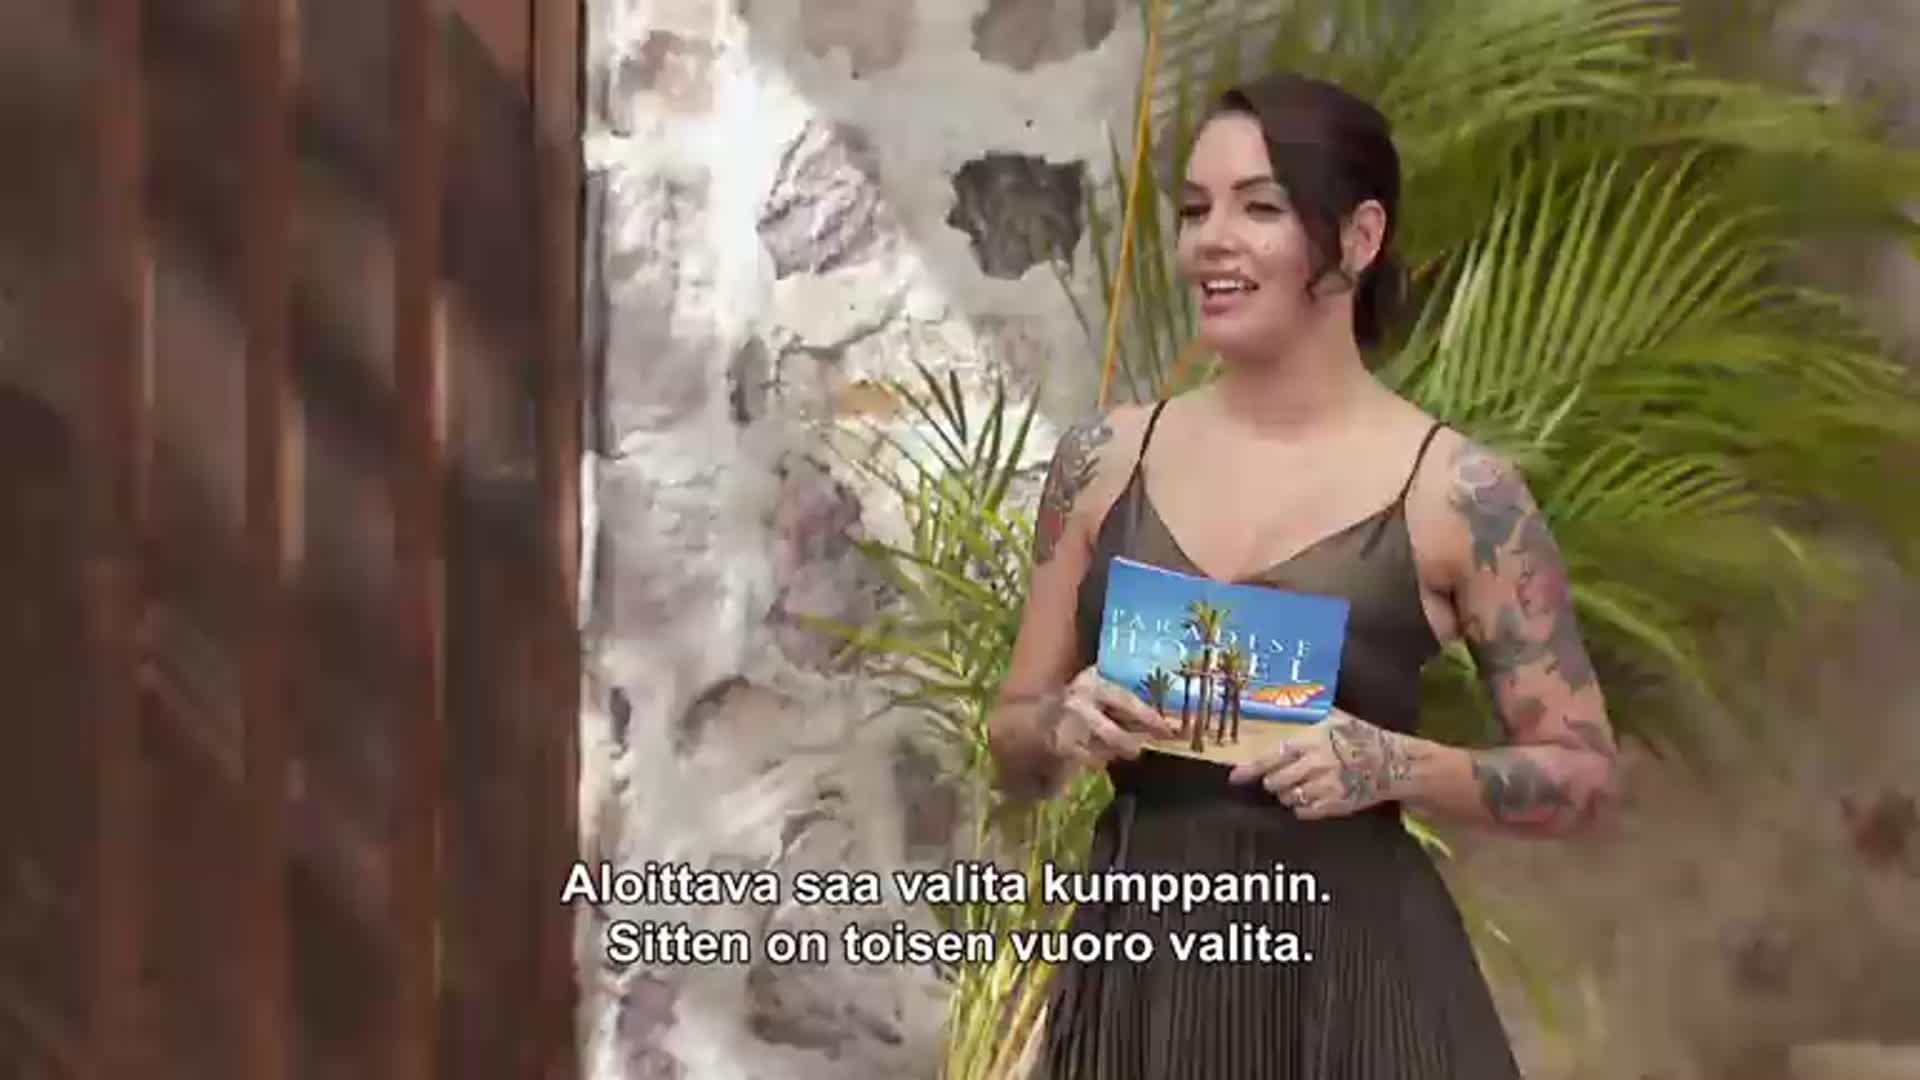 bb inka porno rakennekynnet leppävaara